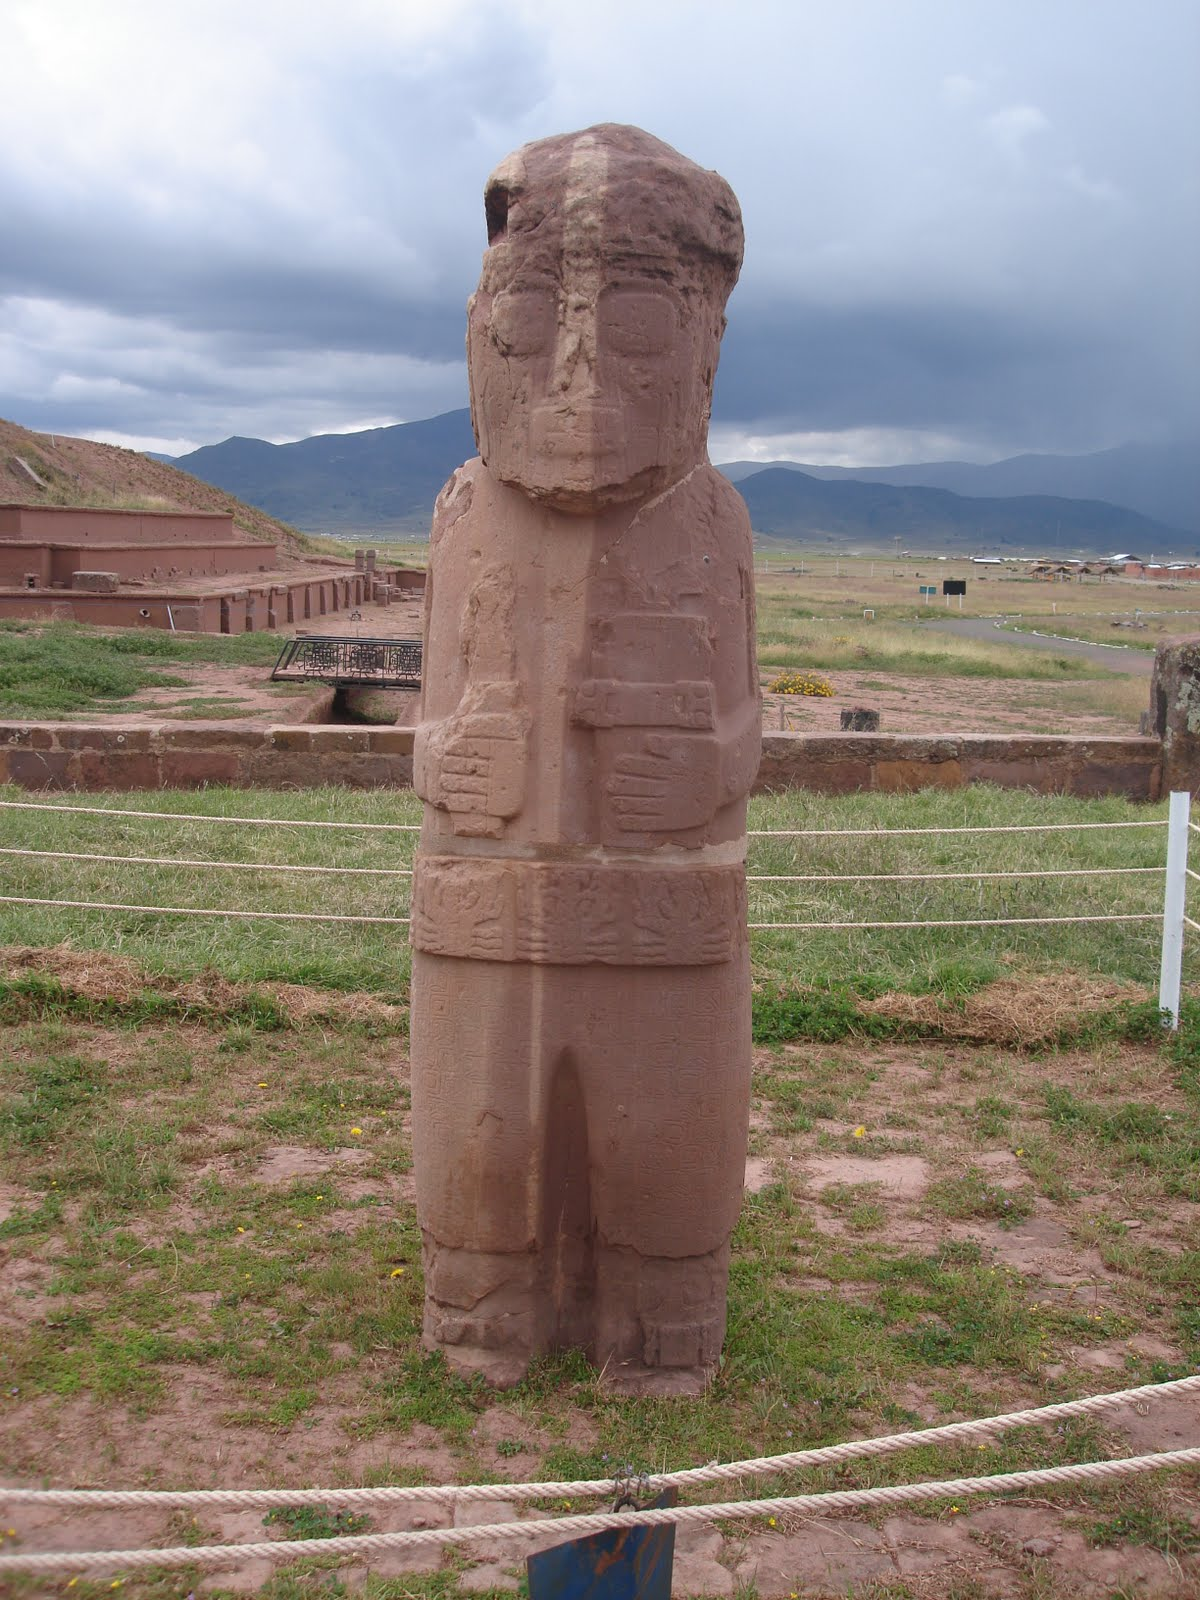 Giant Pumapunku Stone Statue